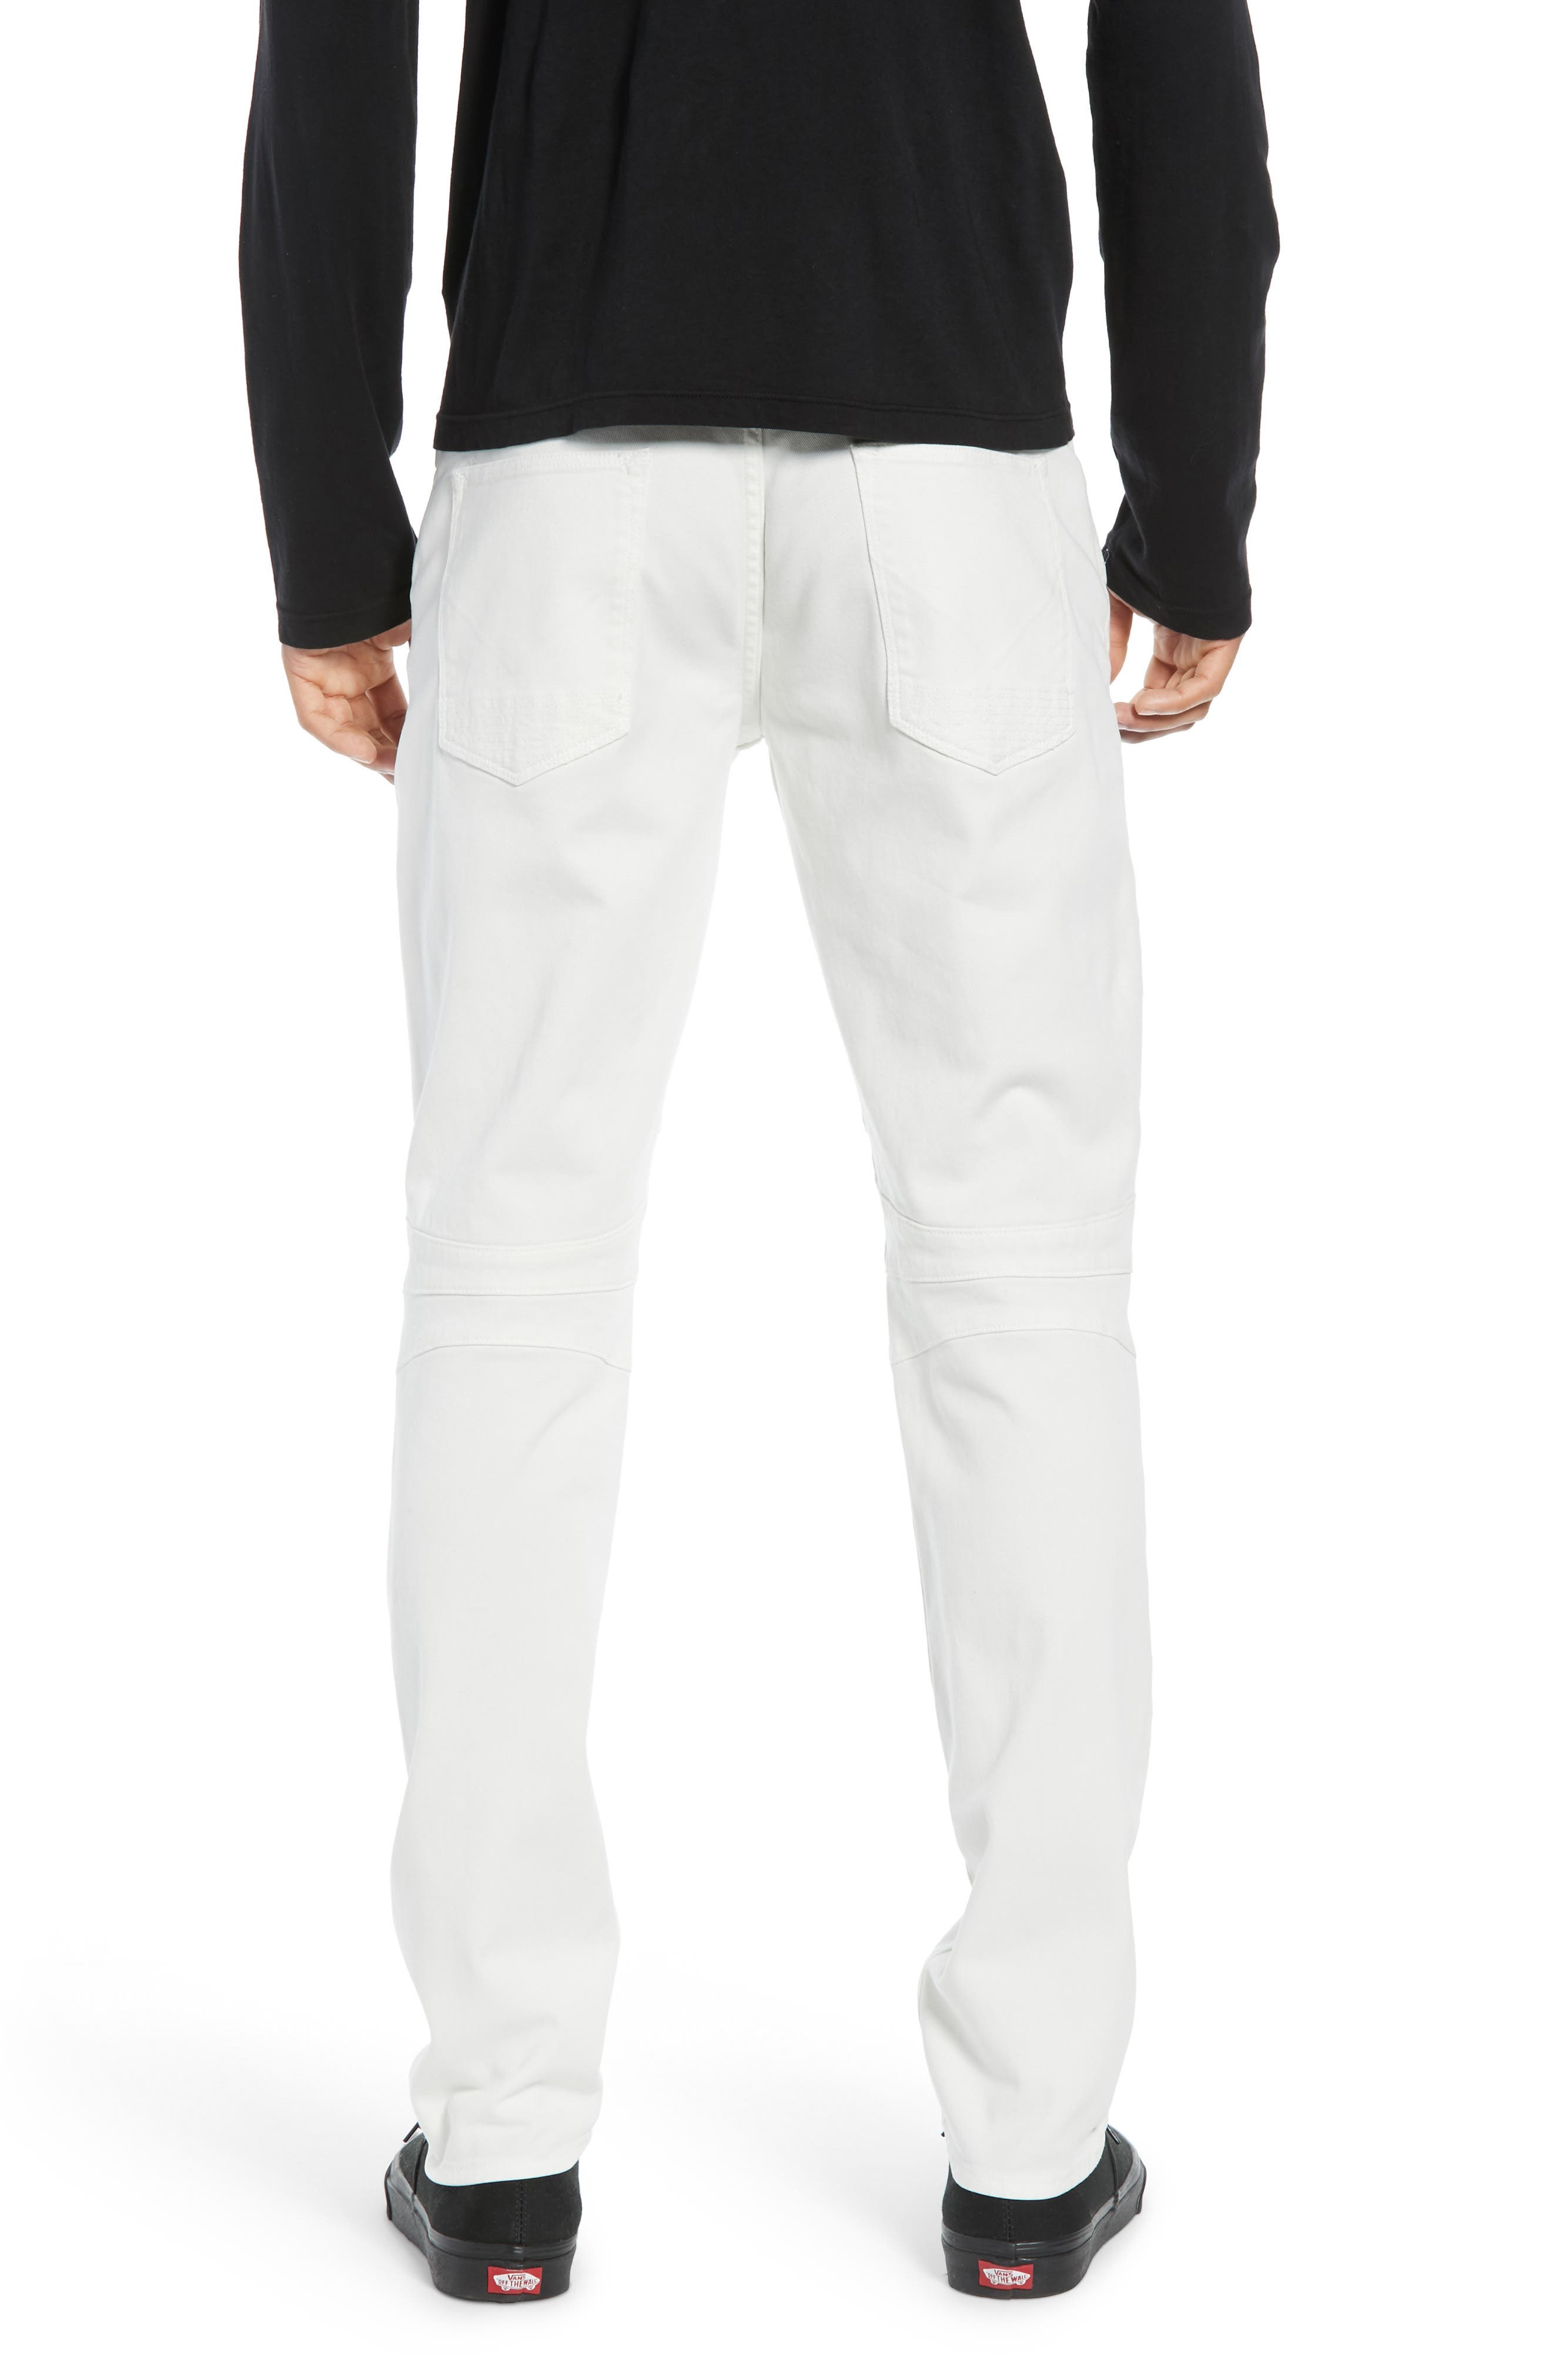 Blinder Biker Skinny Fit Jeans,                             Alternate thumbnail 2, color,                             DIRTY WHITE